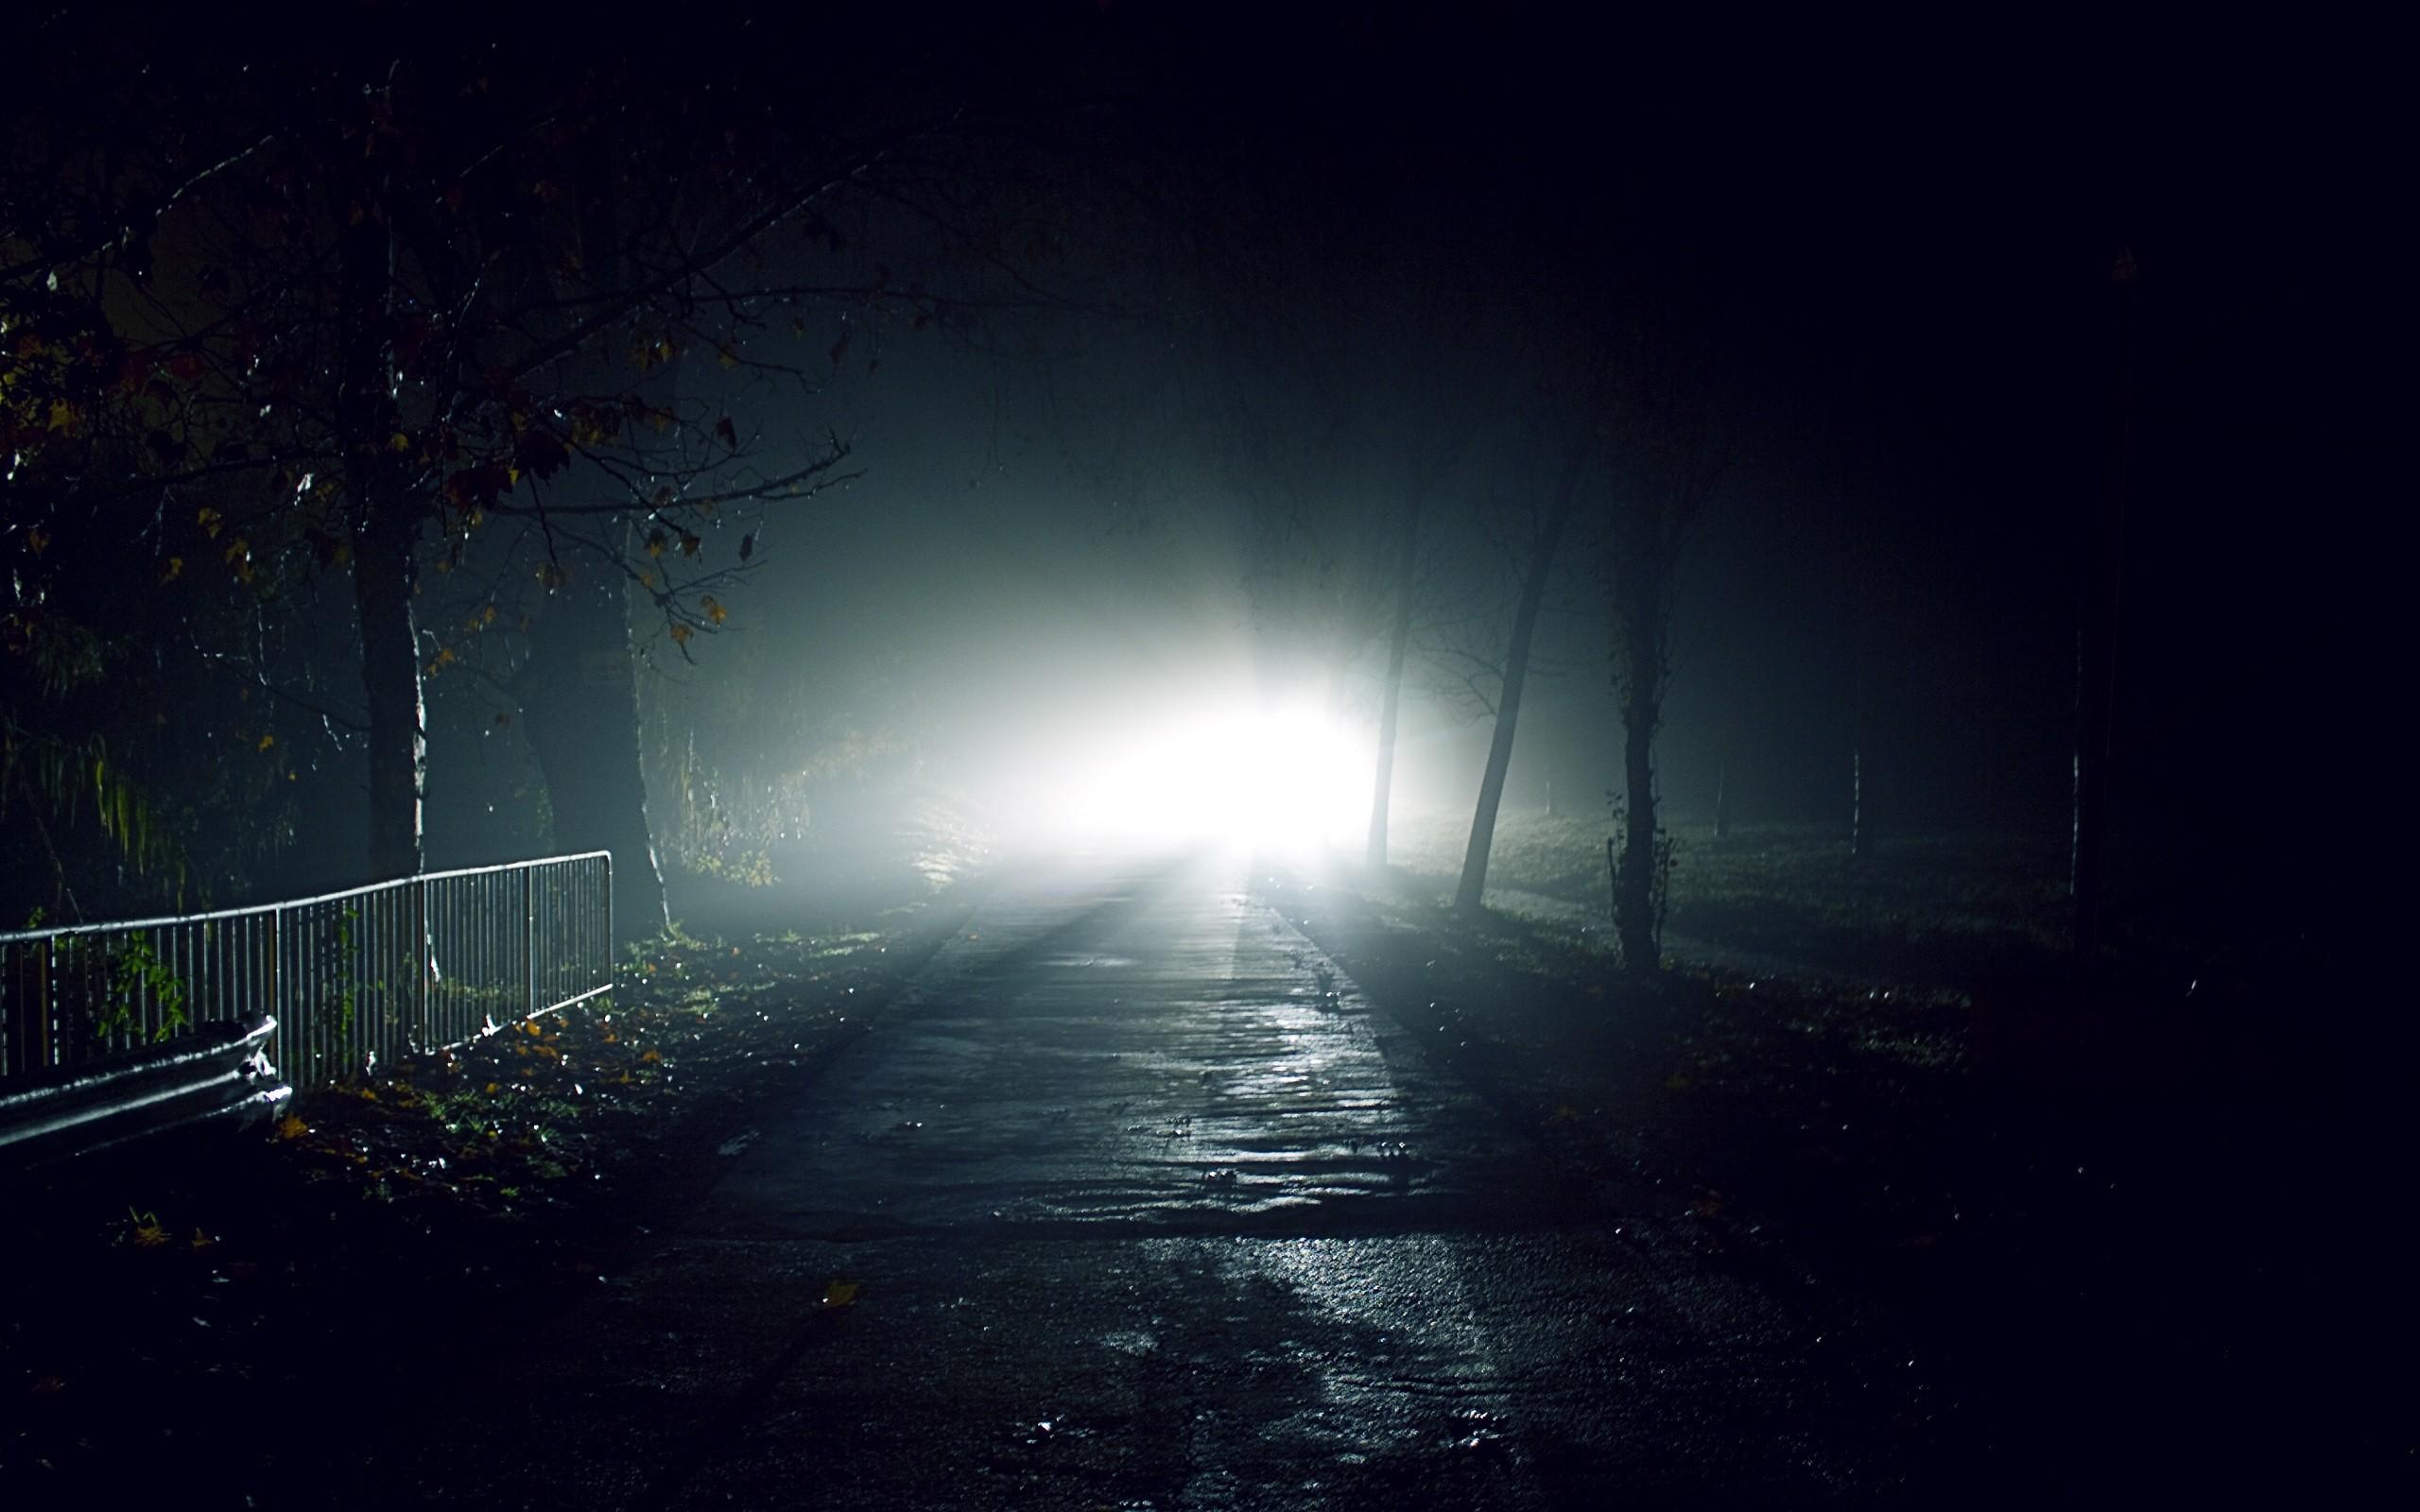 Dark Night Wallpaper 2560x1600 Dark Night Lights Roads Flash 2560x1600